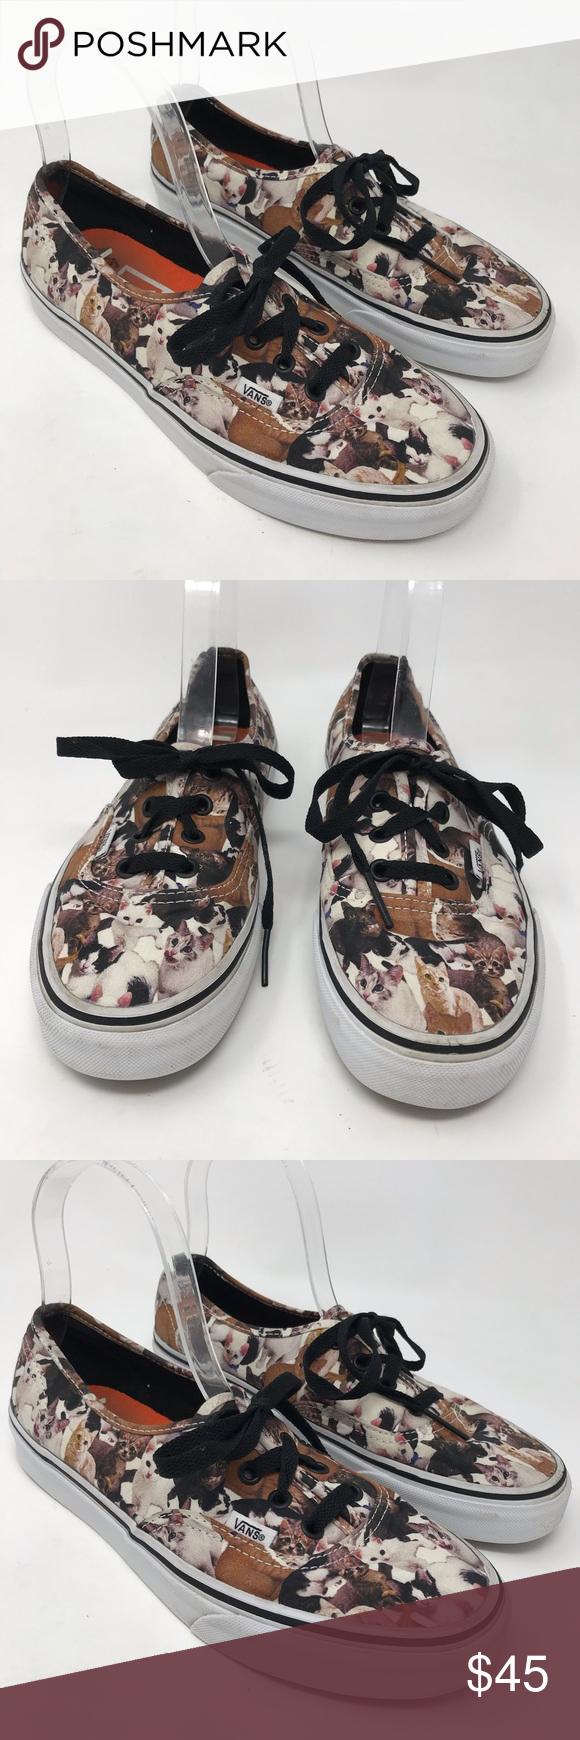 Vans Aspca Cat Lace Up Sneakers Kitten Shoes Sneakers Shoes Vans